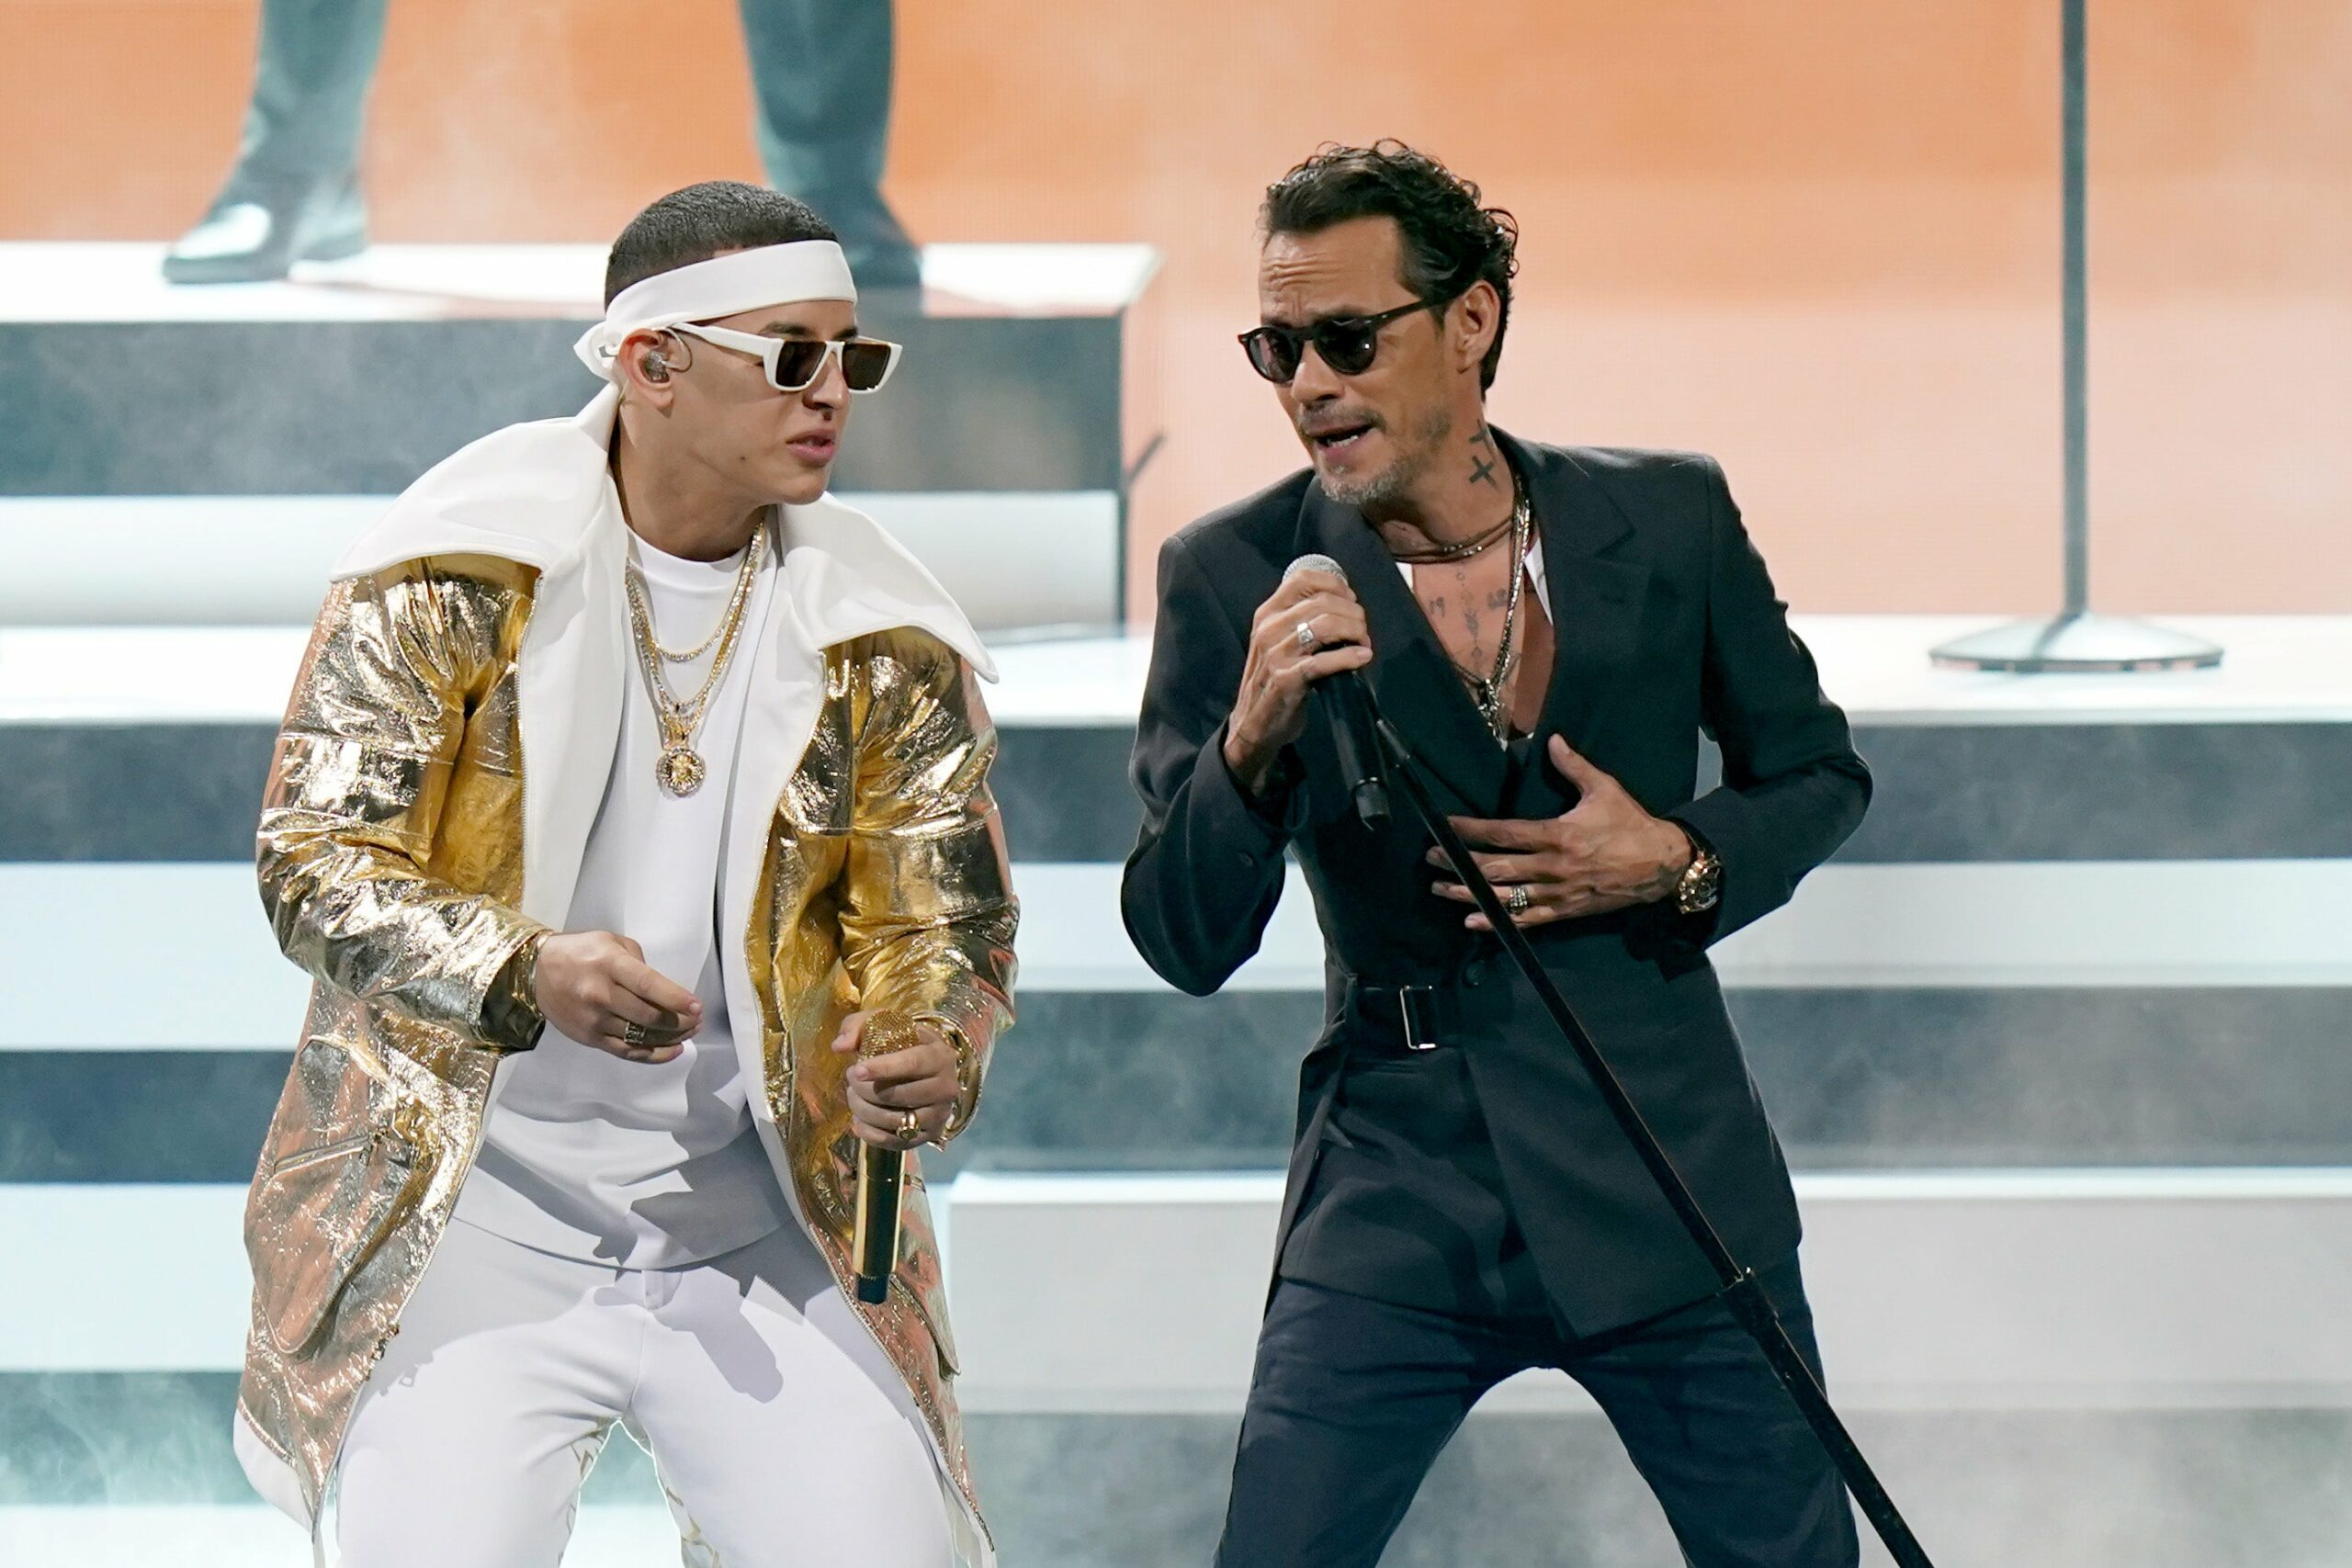 https://salta4400.com/celebrities/2020/11/22/como-marc-anthony-cautivo-en-los-premios-grammy-latino-2020/